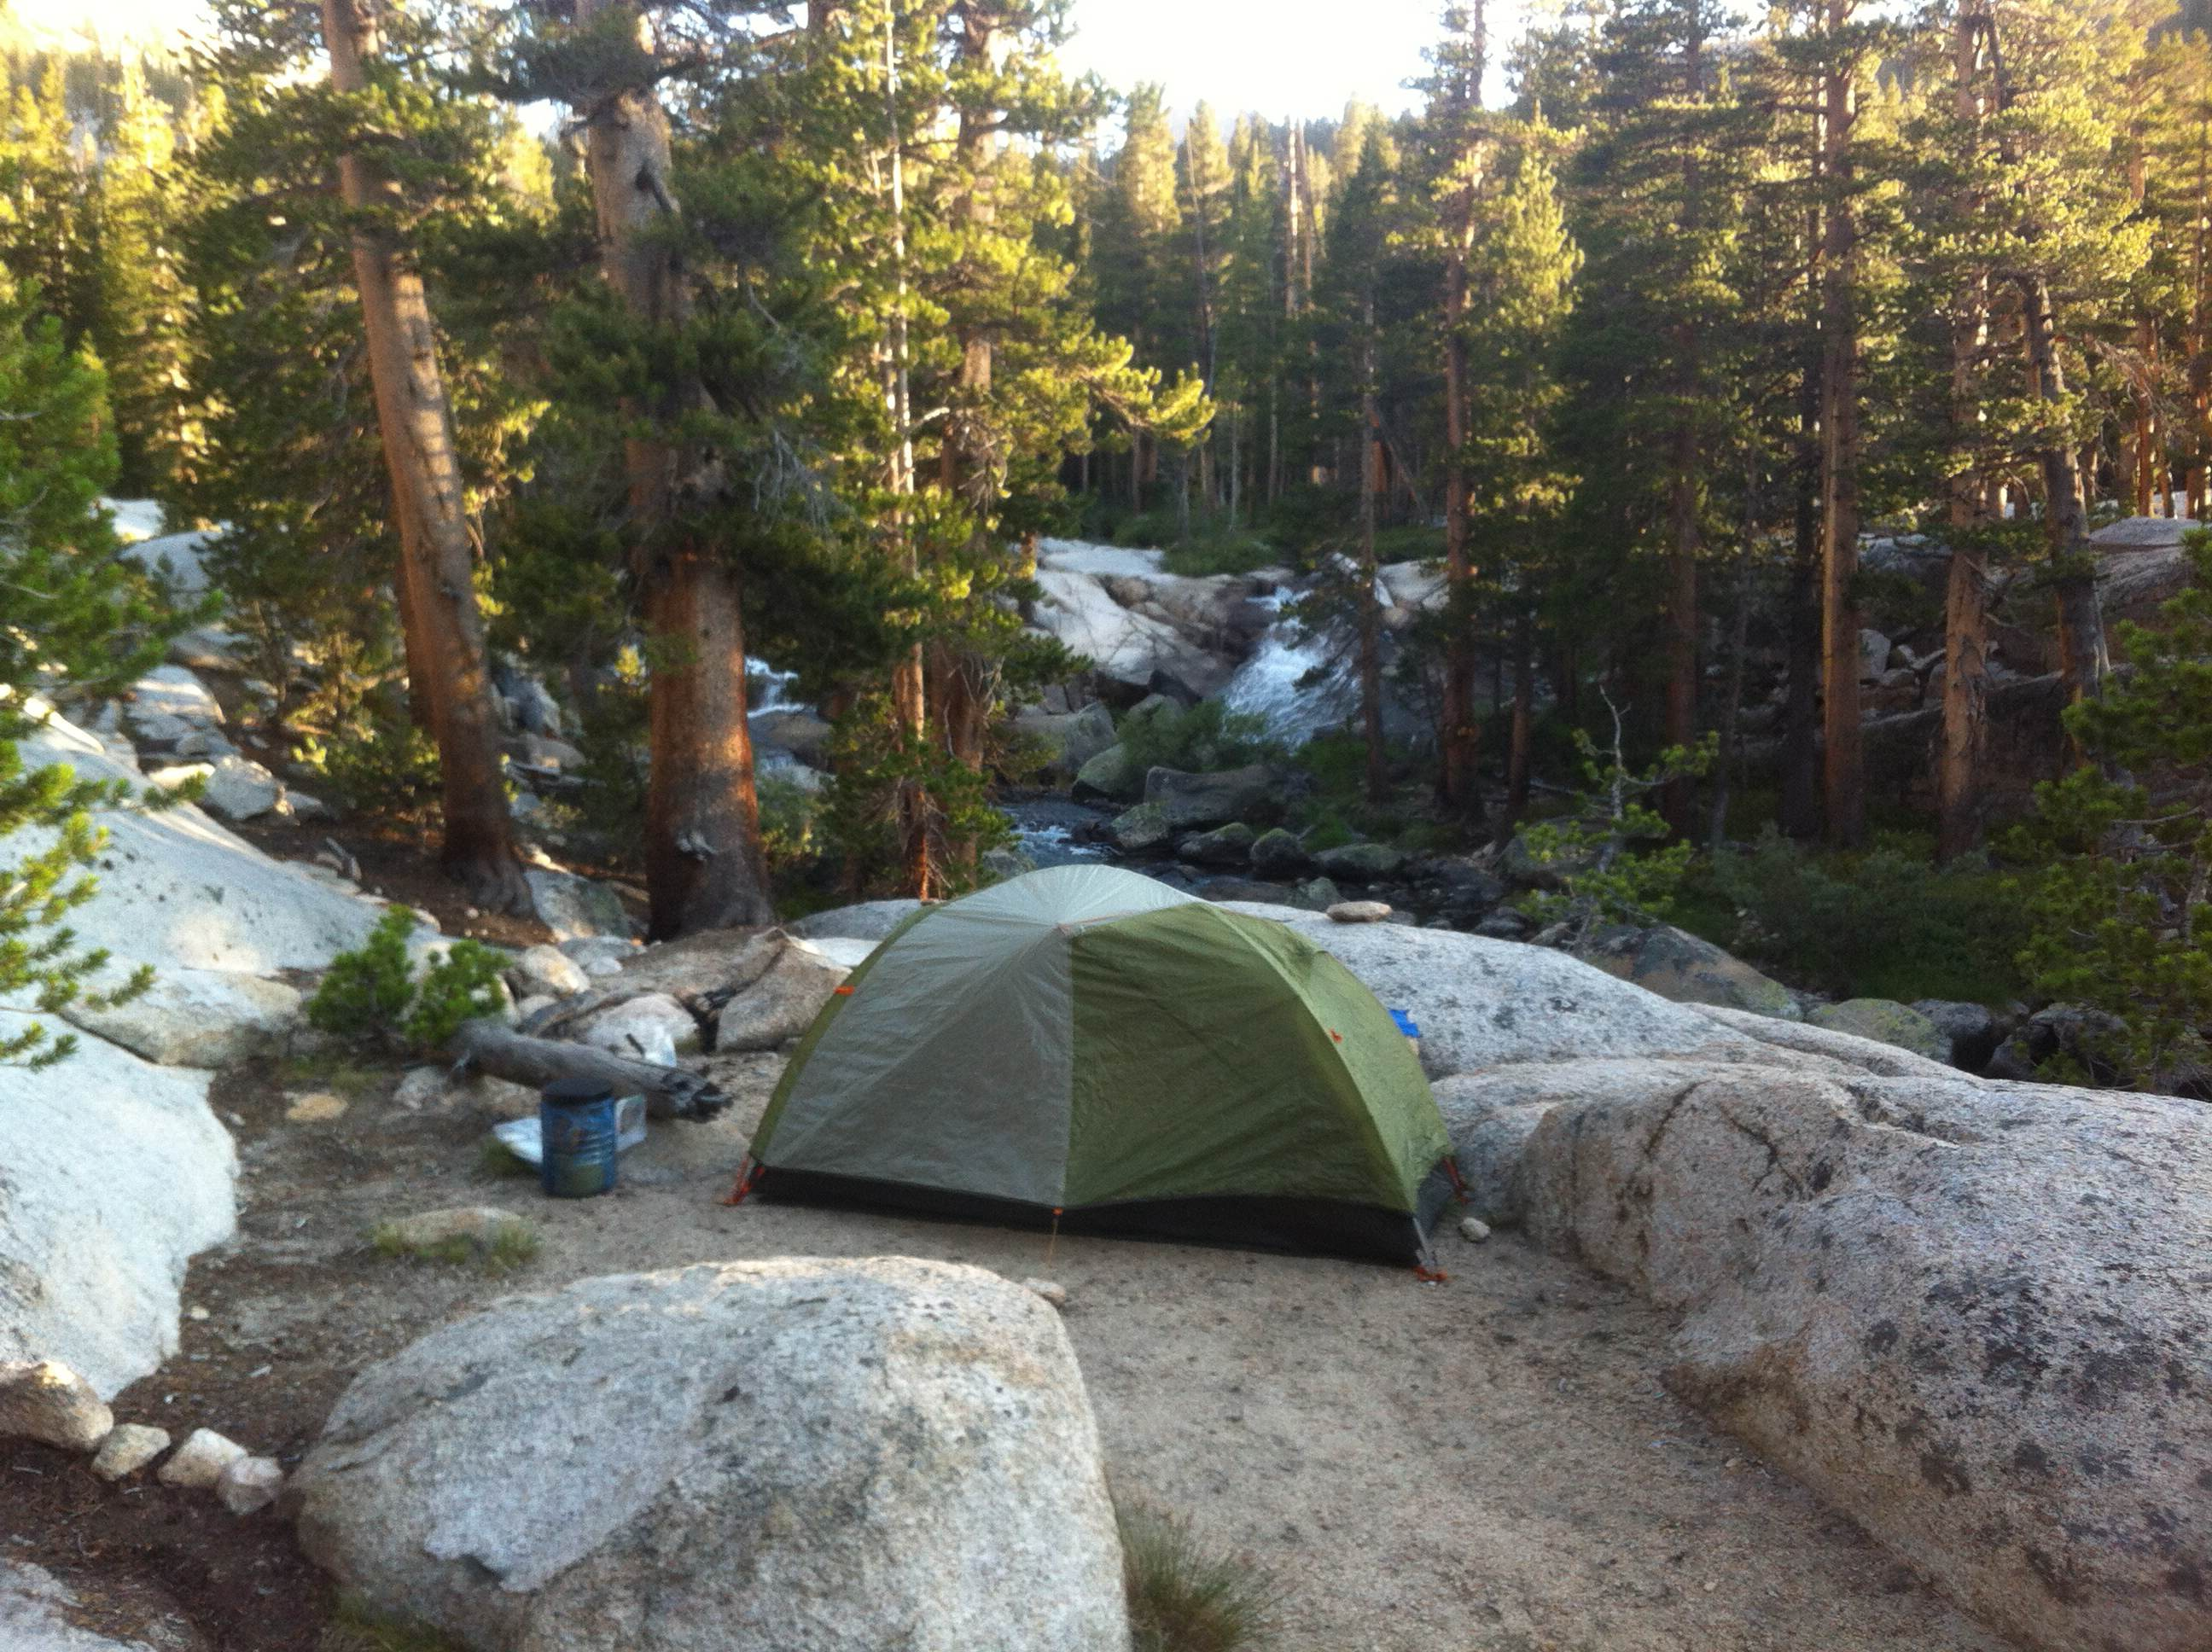 Accommodations. (Photo: Diana Schlaff)